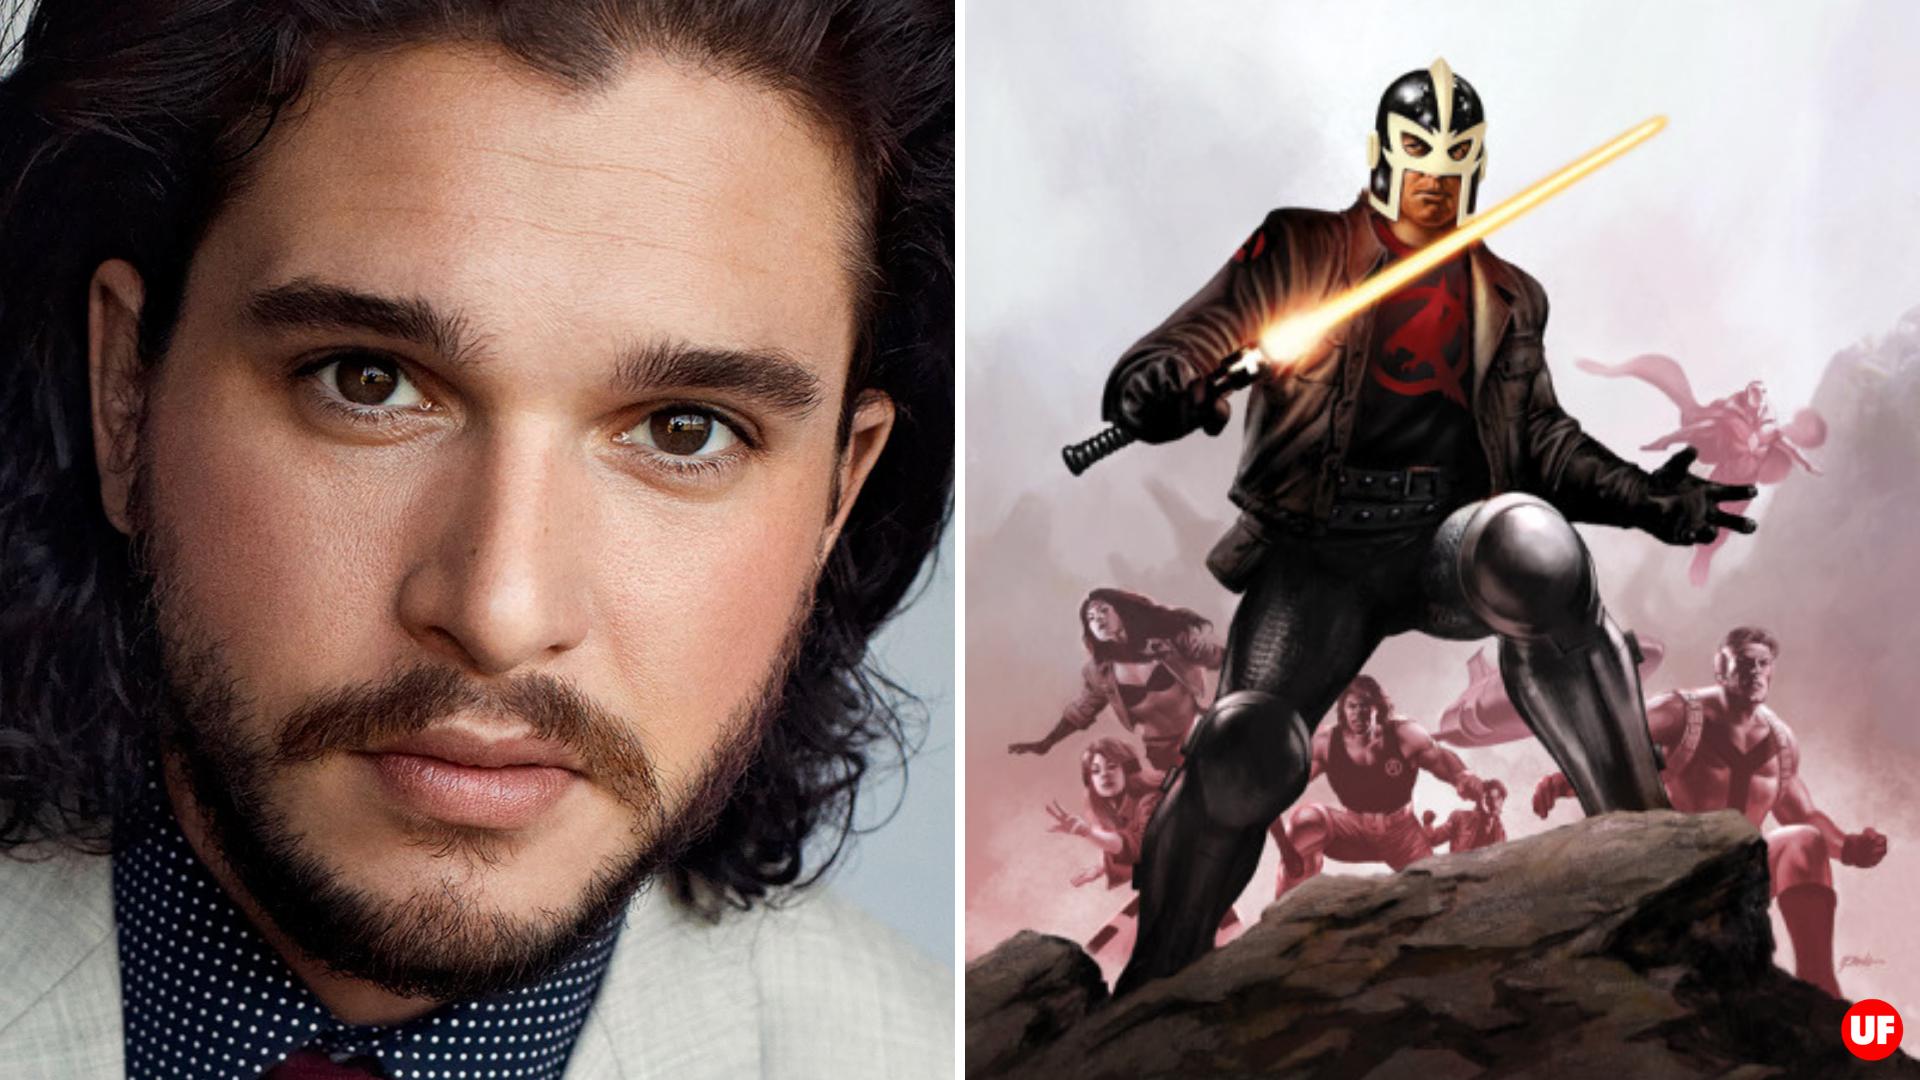 Kit Harington Joins Mcu S Eternals As Dane Whitman Aka Black Knight Marvel Cinematic Universe Mcu Jon Snow Marvel Studios Kevi Blackest Knight Mcu Knight